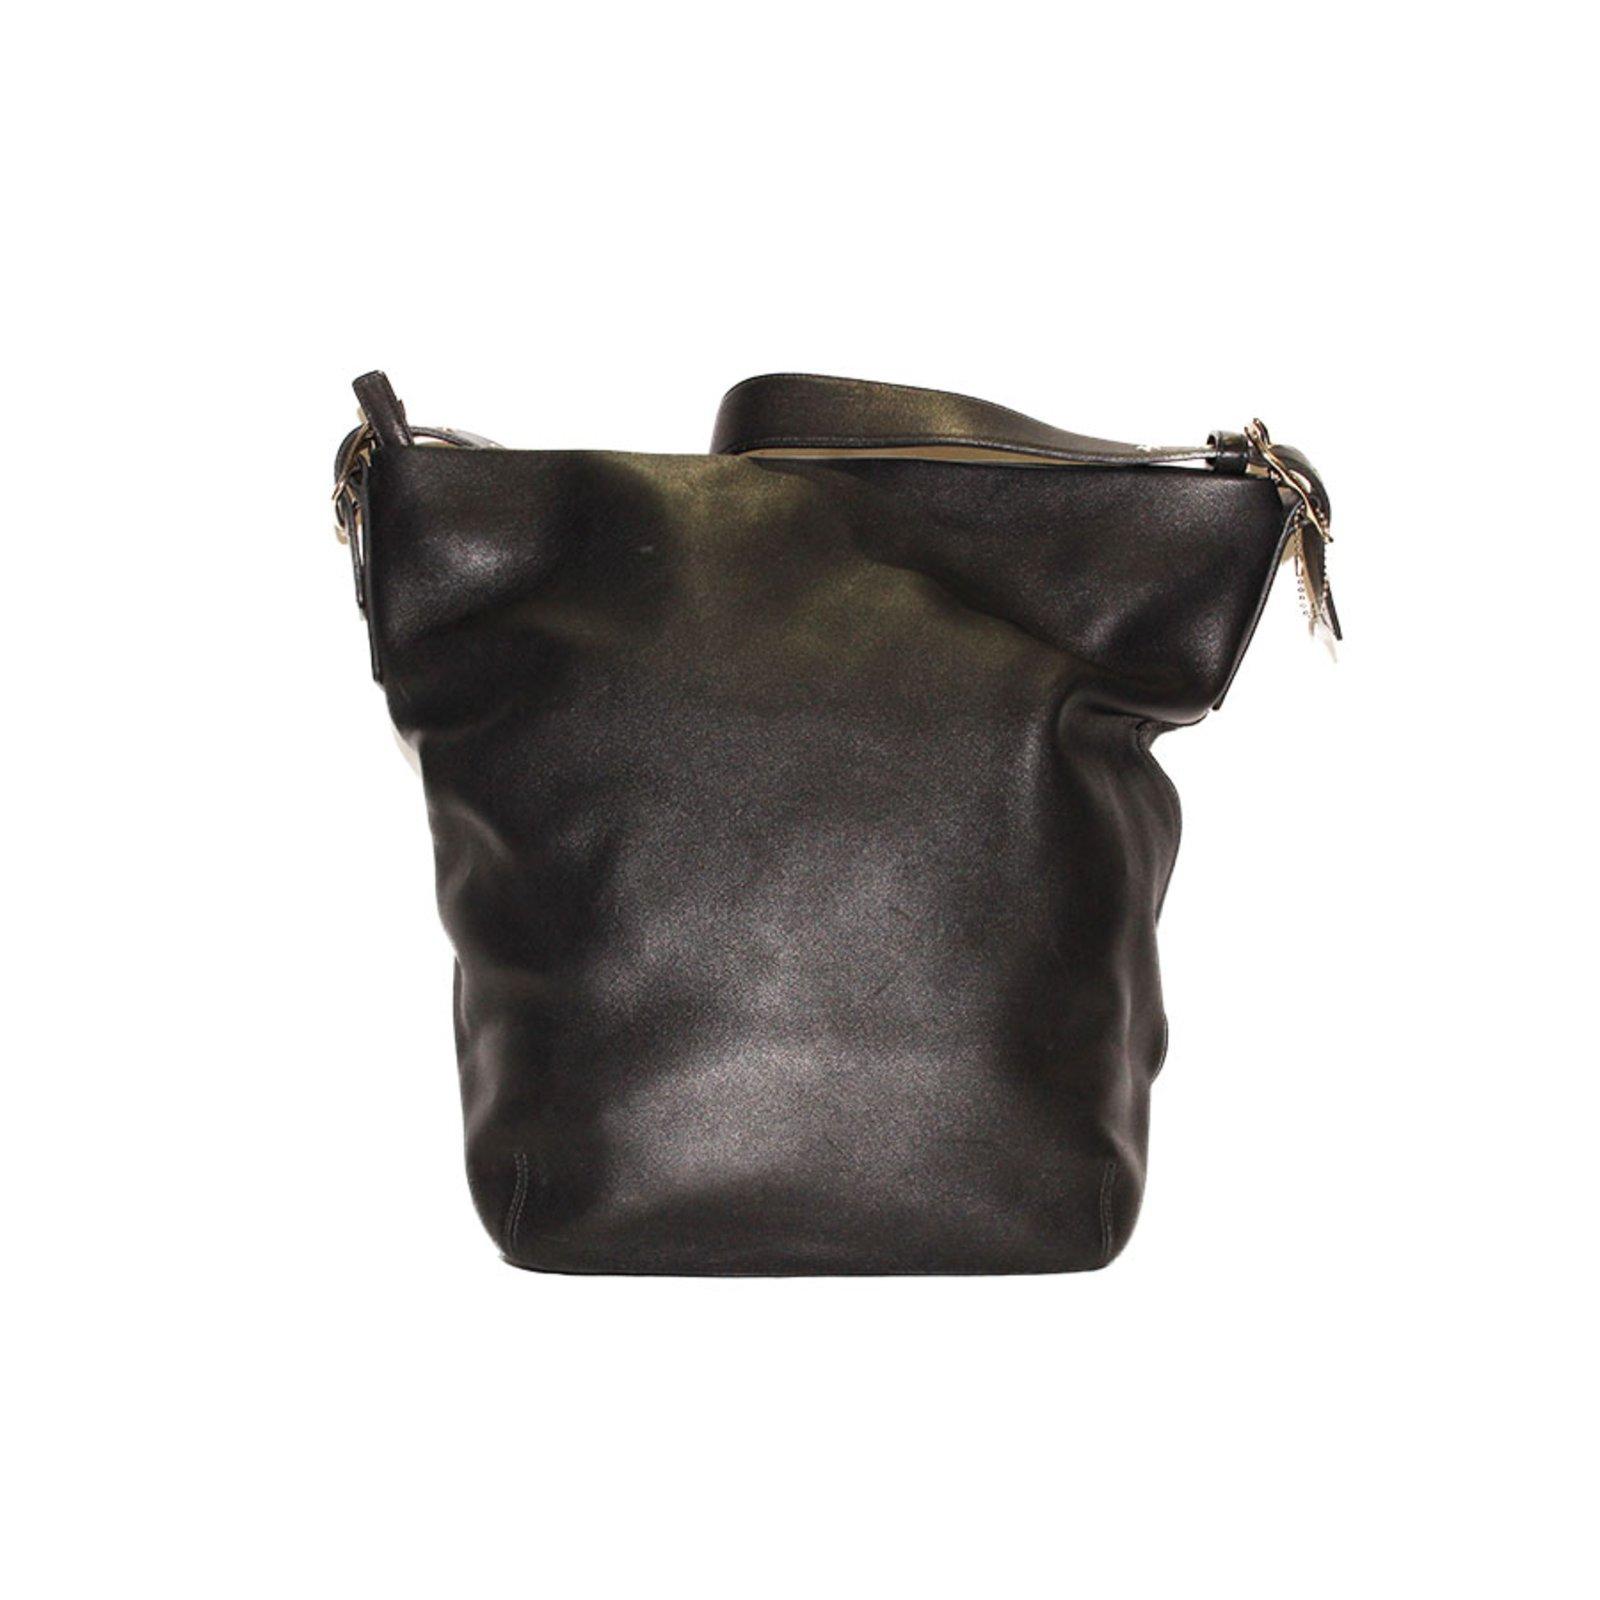 sacs main coach sac coach en cuir noir anse en cuir cuir noir joli closet. Black Bedroom Furniture Sets. Home Design Ideas